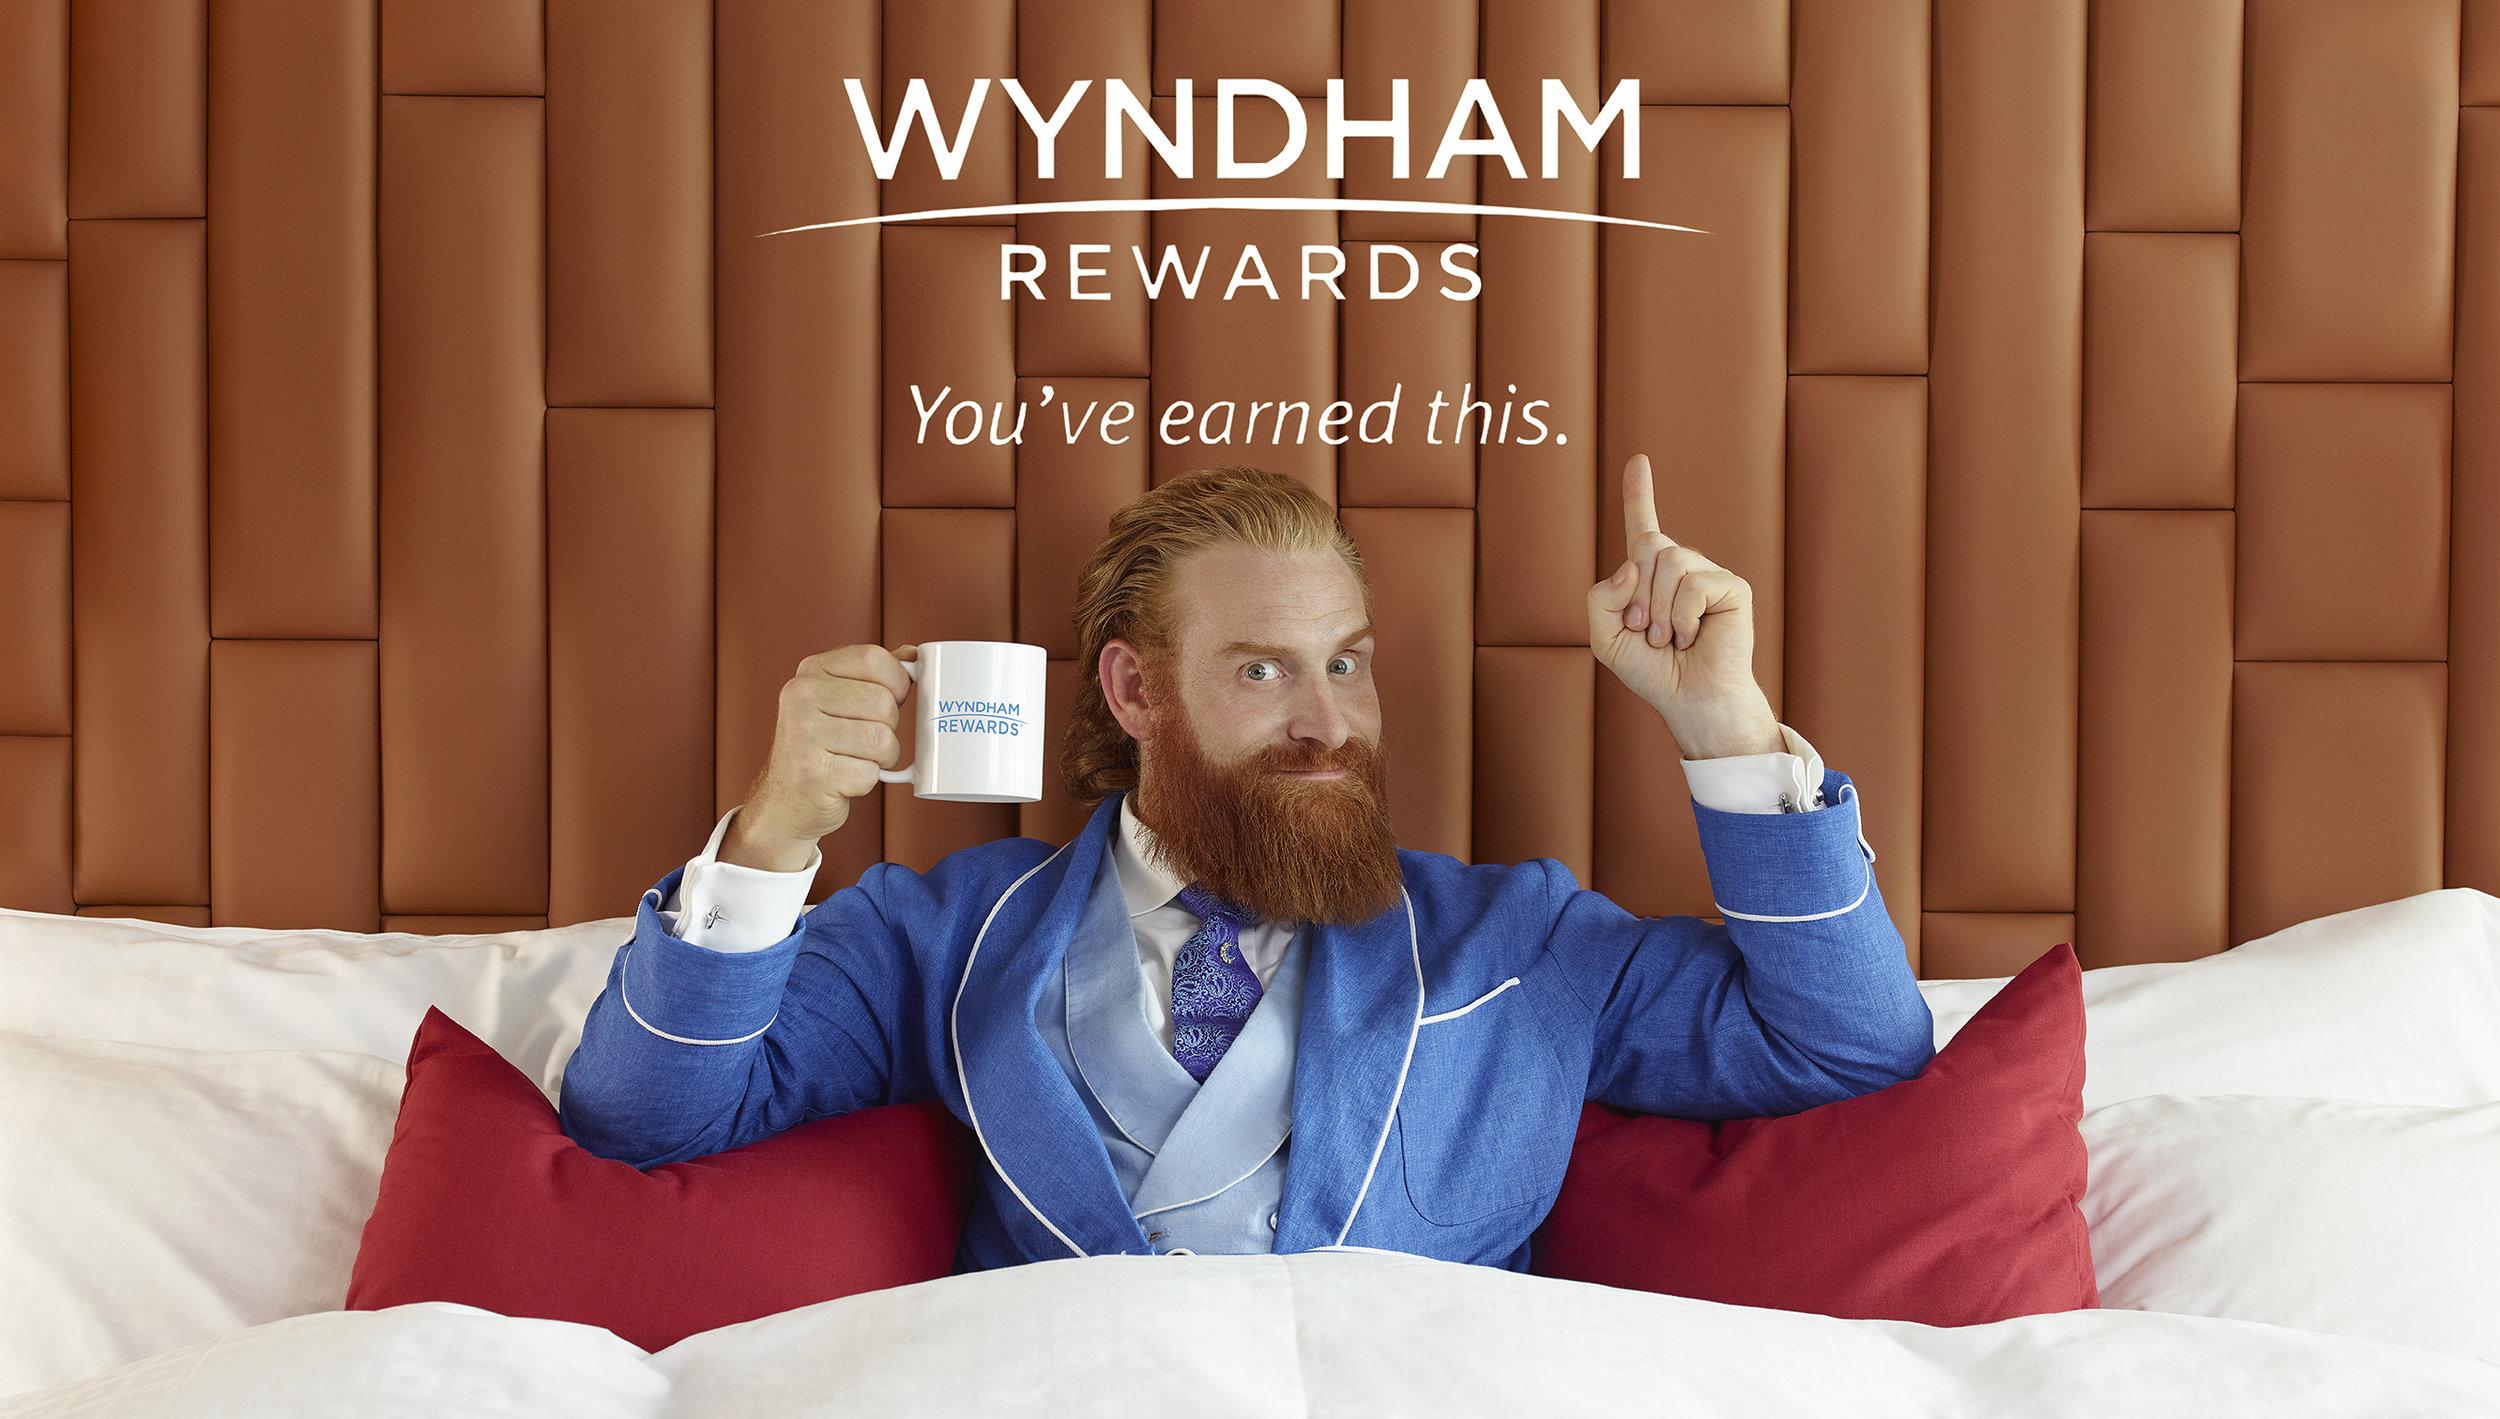 080817WY_wyndham_wyzard_ramada_pudong_bedroom_334_09222017 copy.jpg